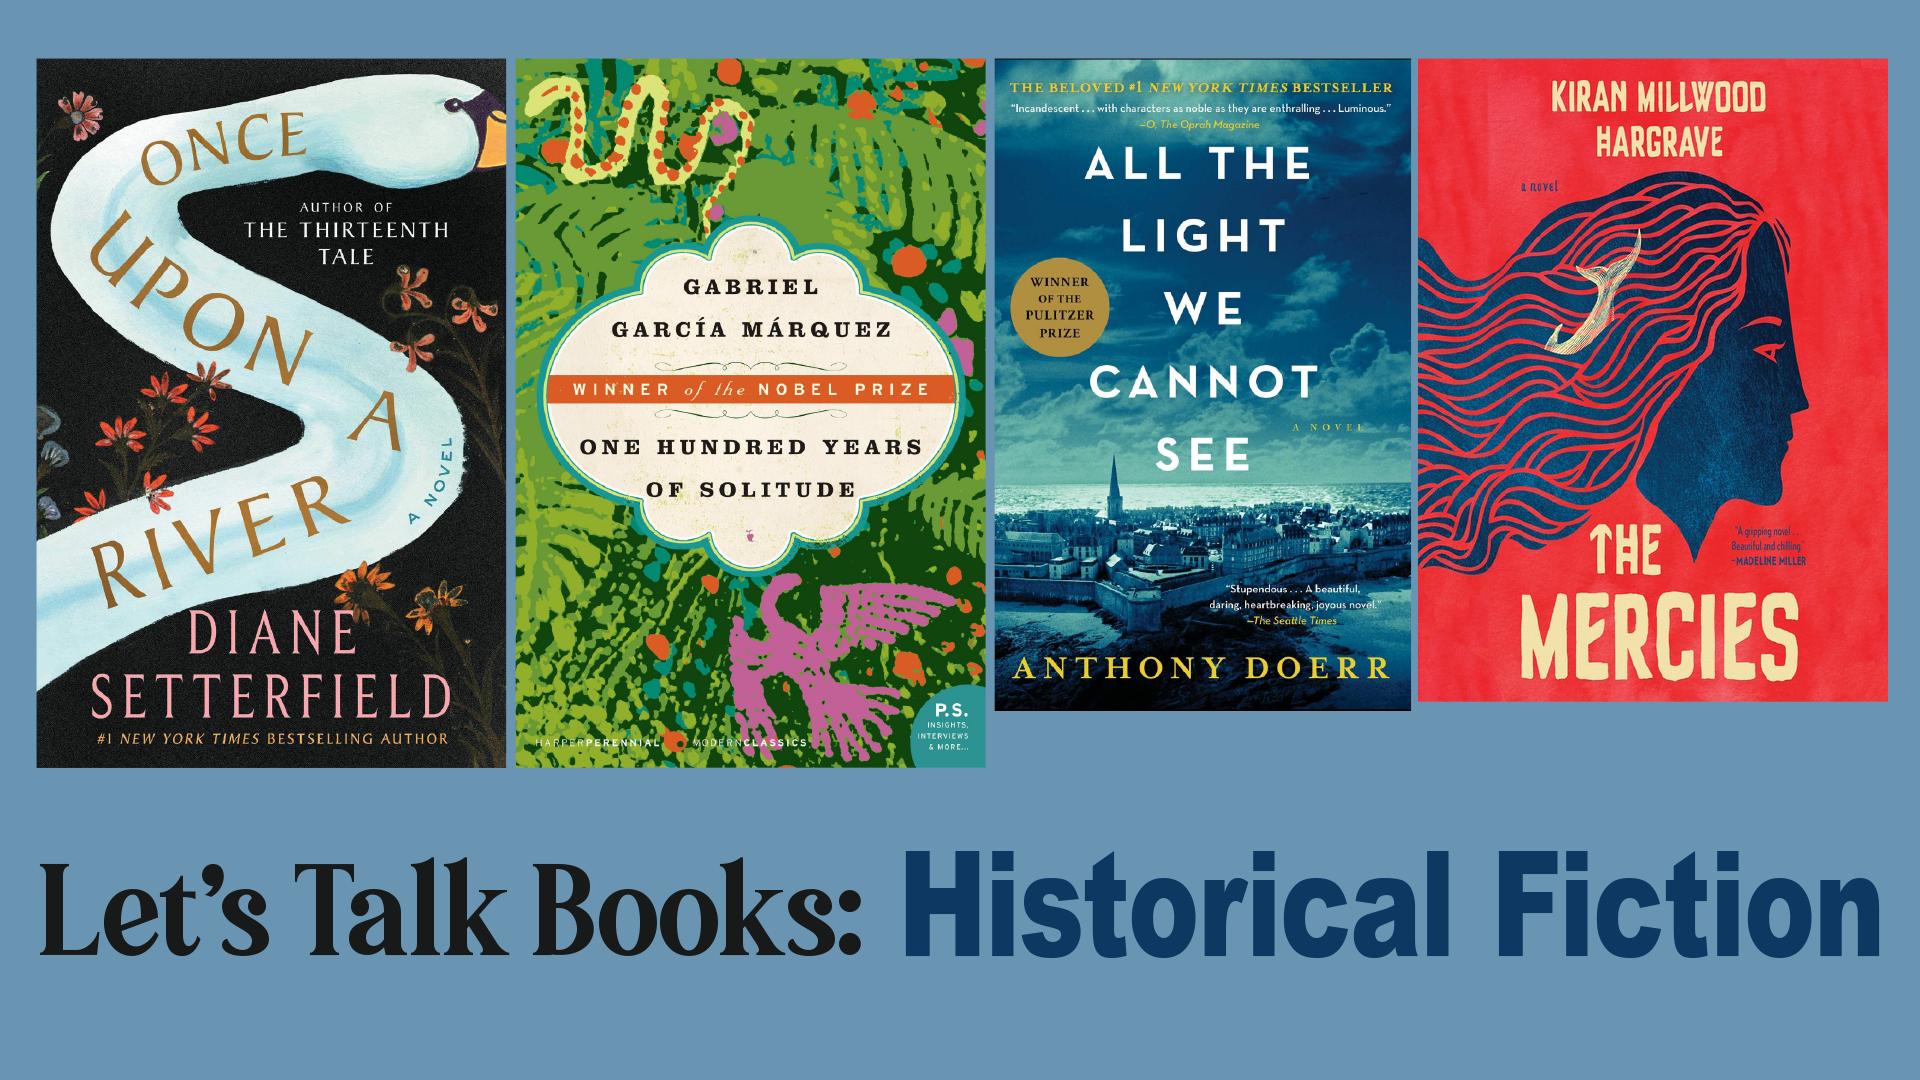 Let's Talk Books: Historical Fiction